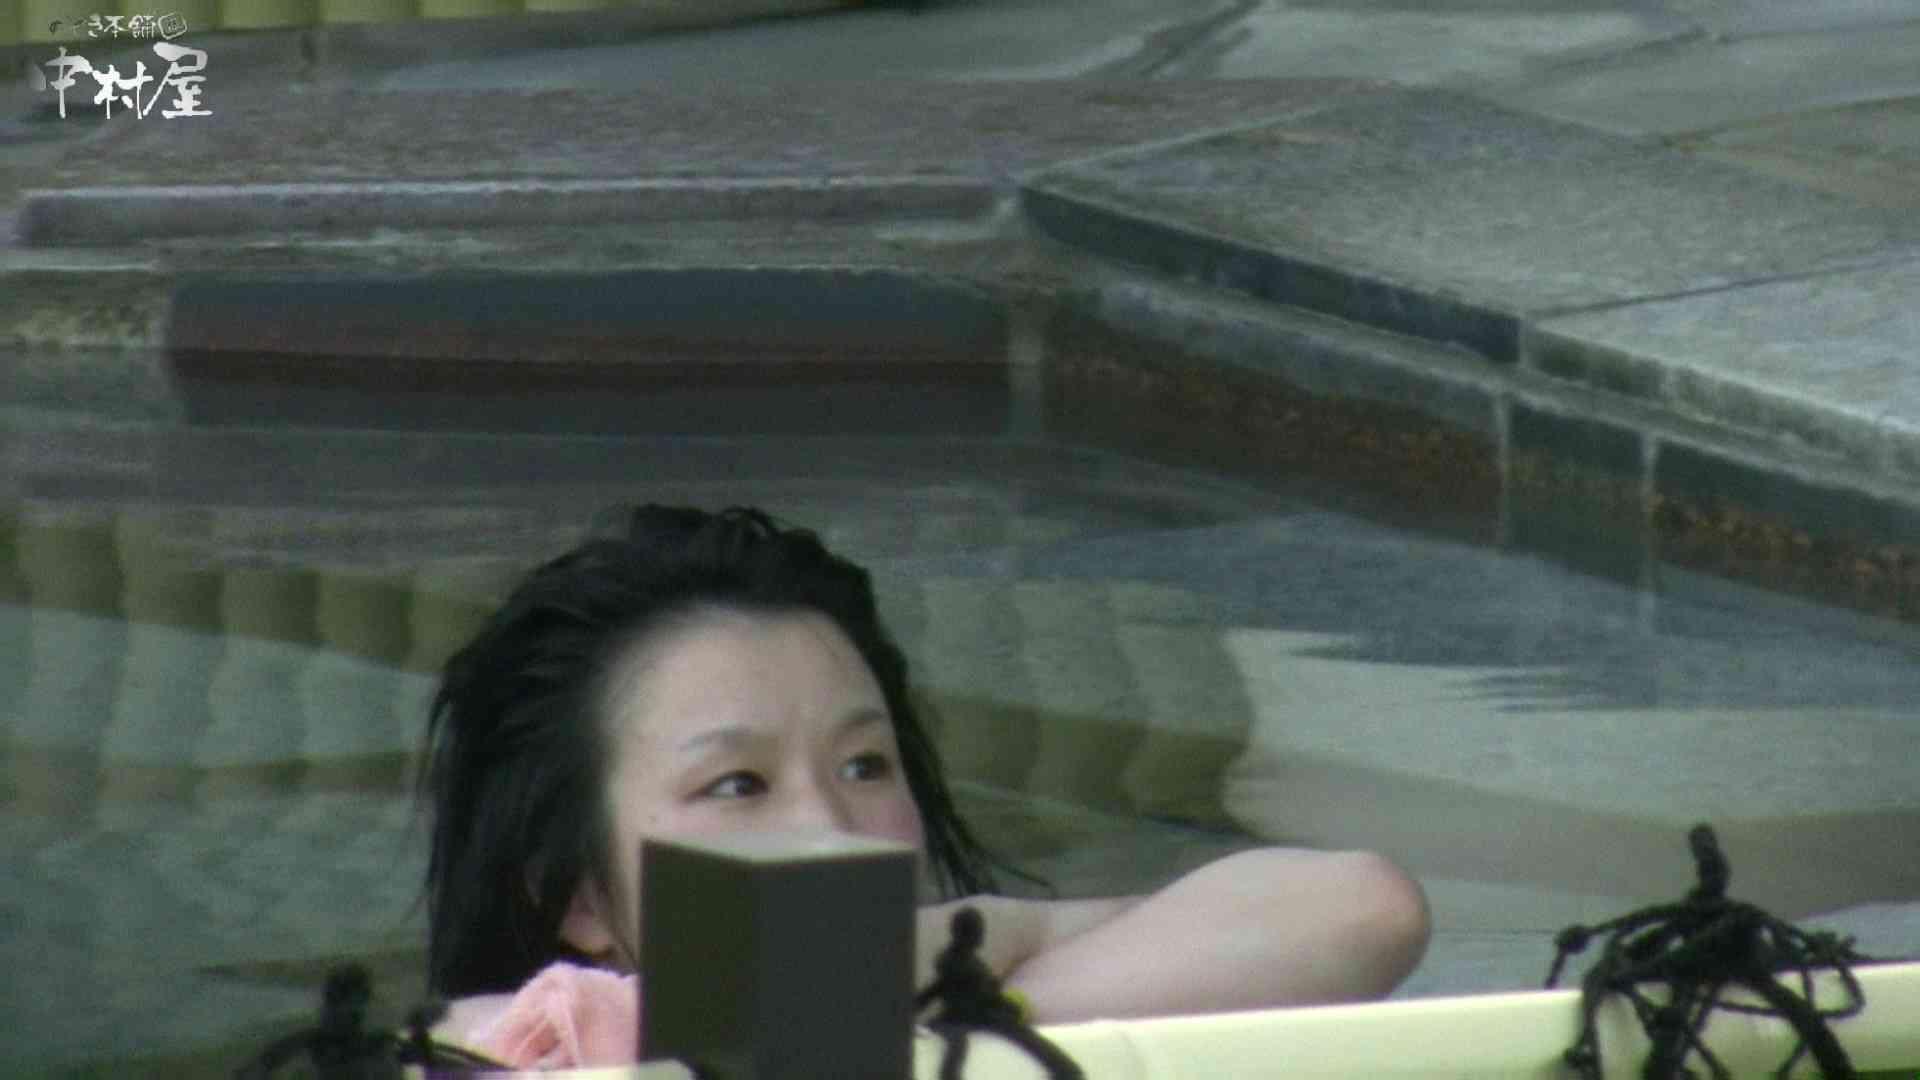 Aquaな露天風呂Vol.982 露天風呂突入 SEX無修正画像 78pic 8